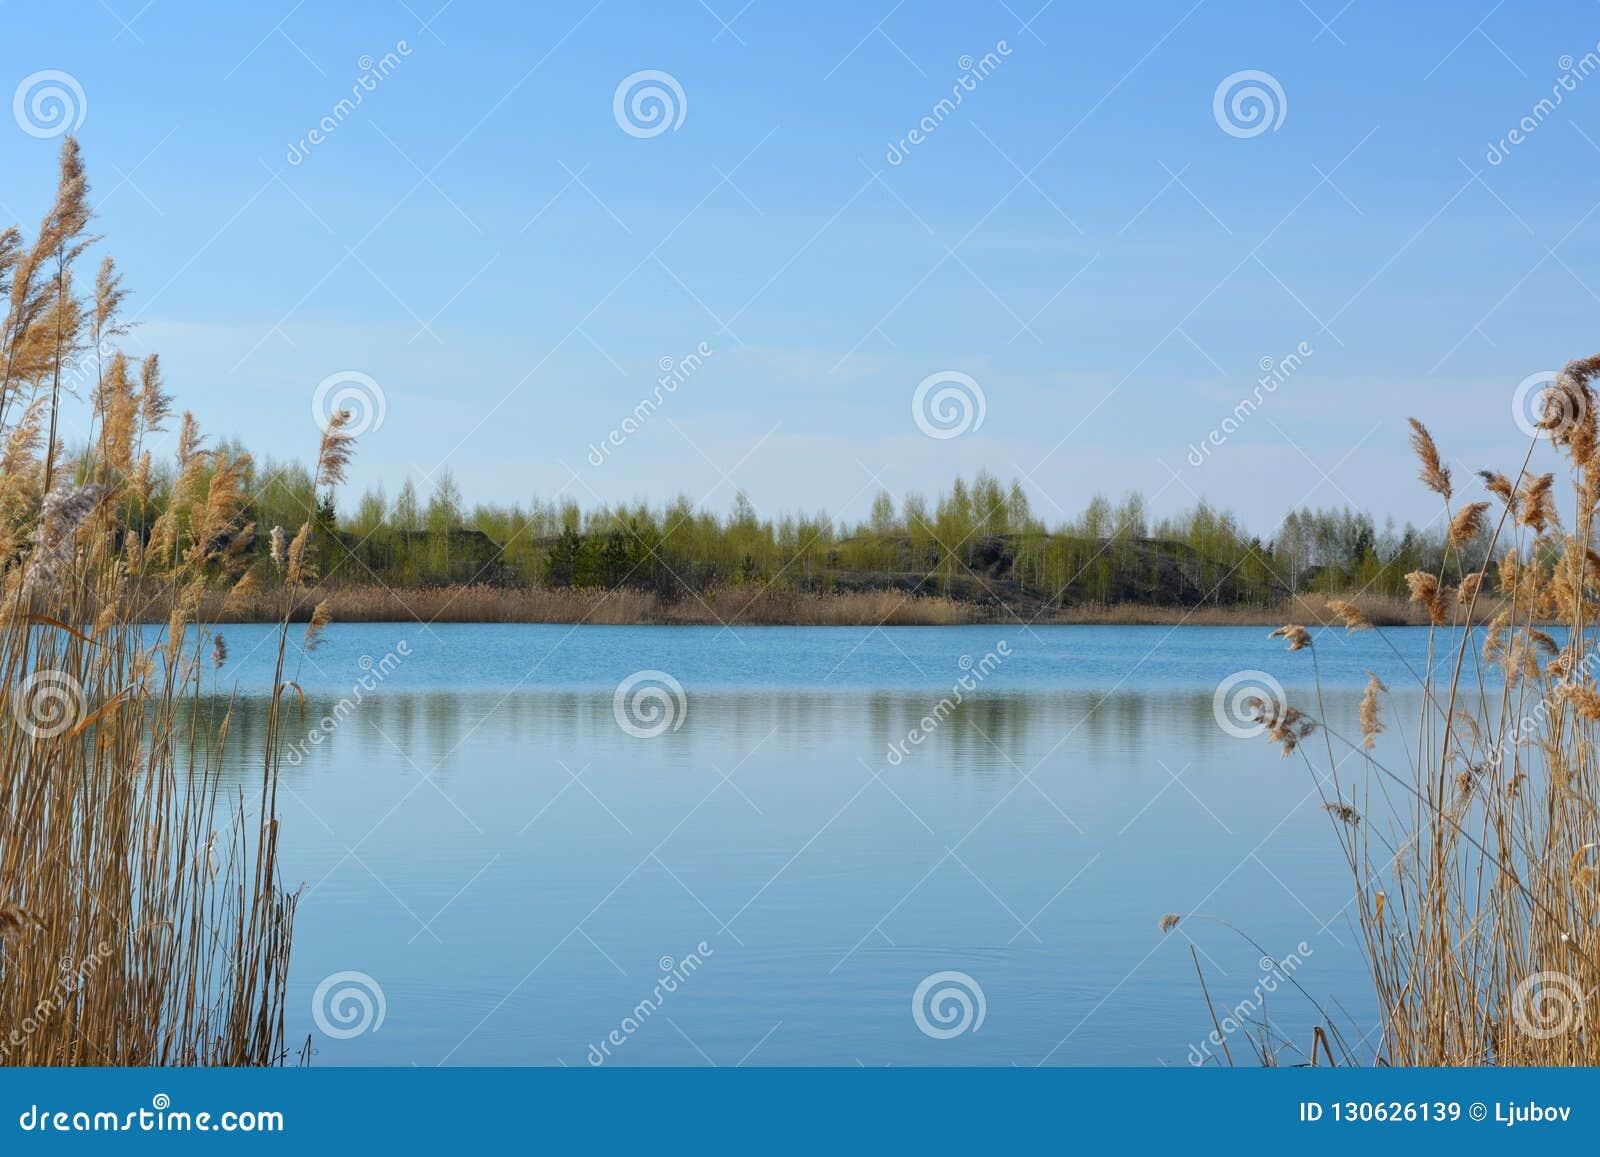 Pittoreskt rysslandskap Sikt av sjön med klart blått vatten mellan busksnåren av torra vasser